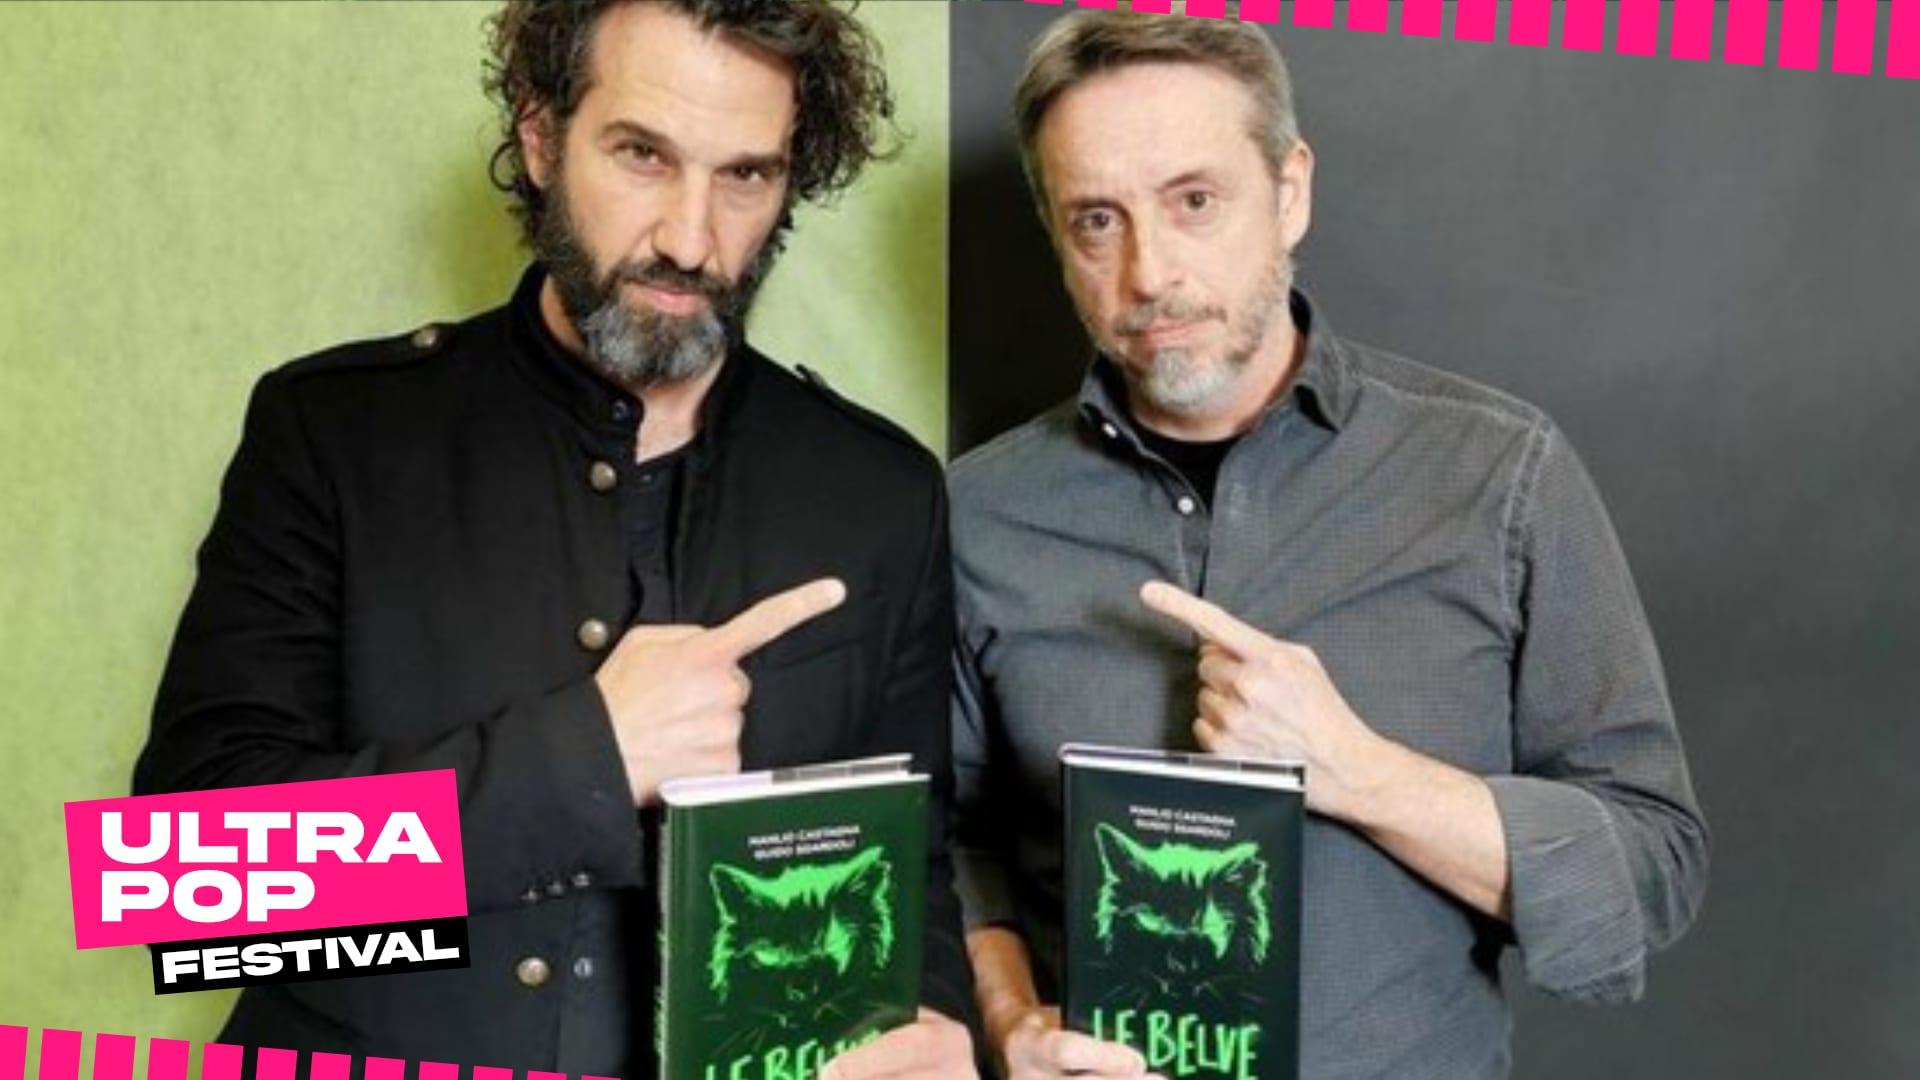 Stephen King e Le Belve: influenze horror tra cinema e letteratura - UltraPop Festival 2020